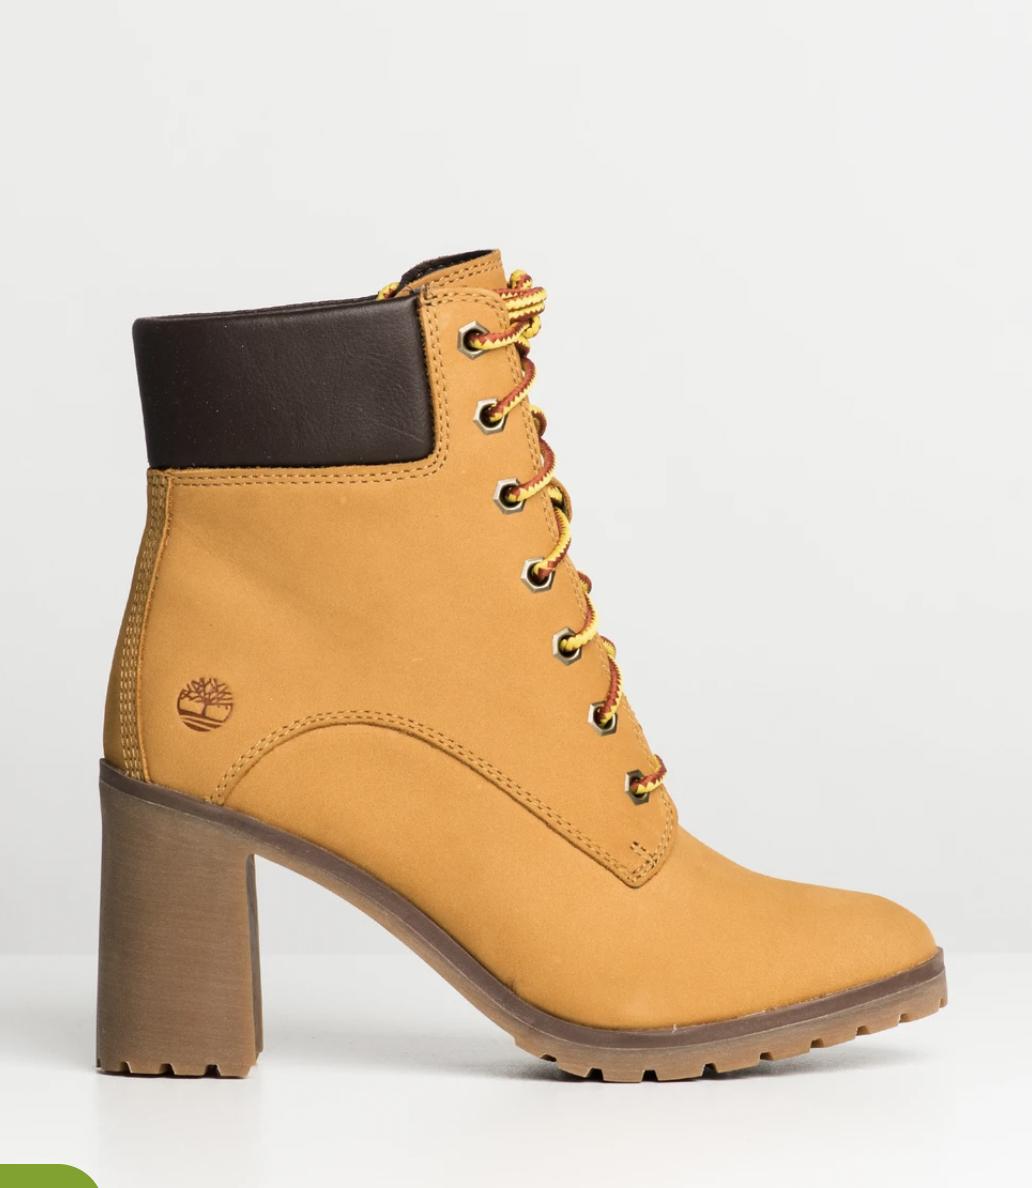 Timberland Womens Allington Lace up Boot